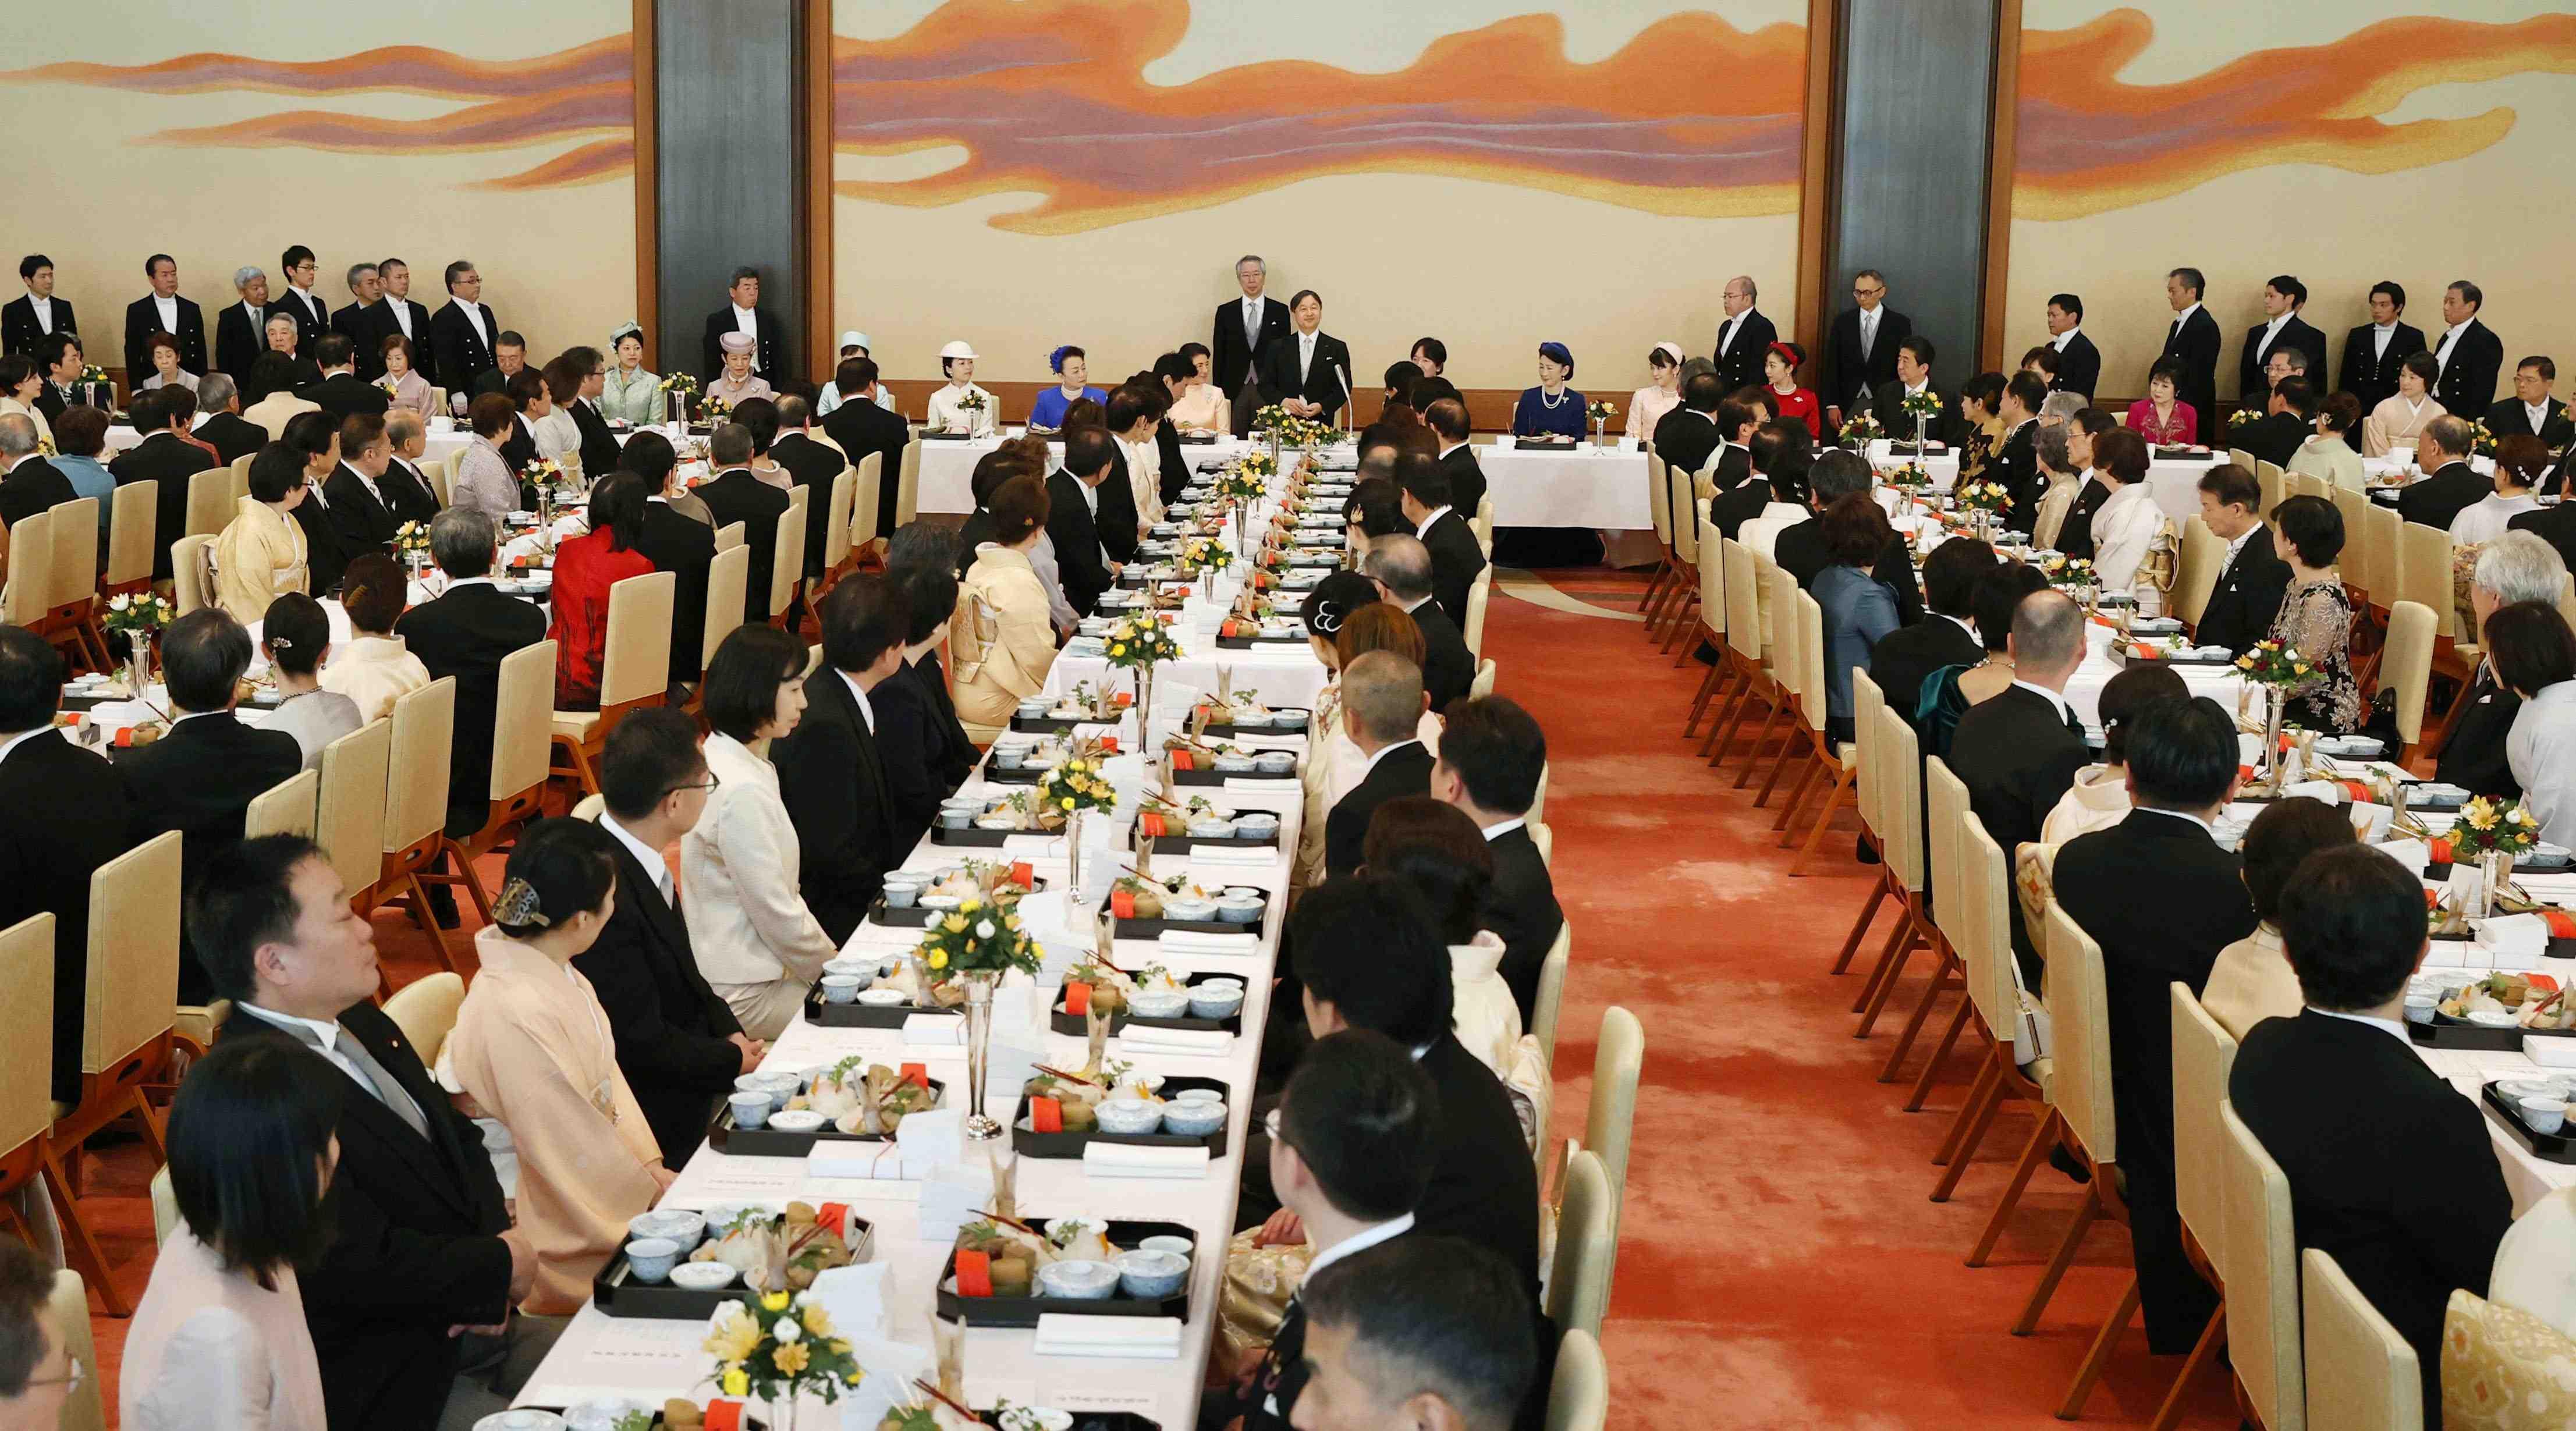 Japan Emperor's 60th Birthday